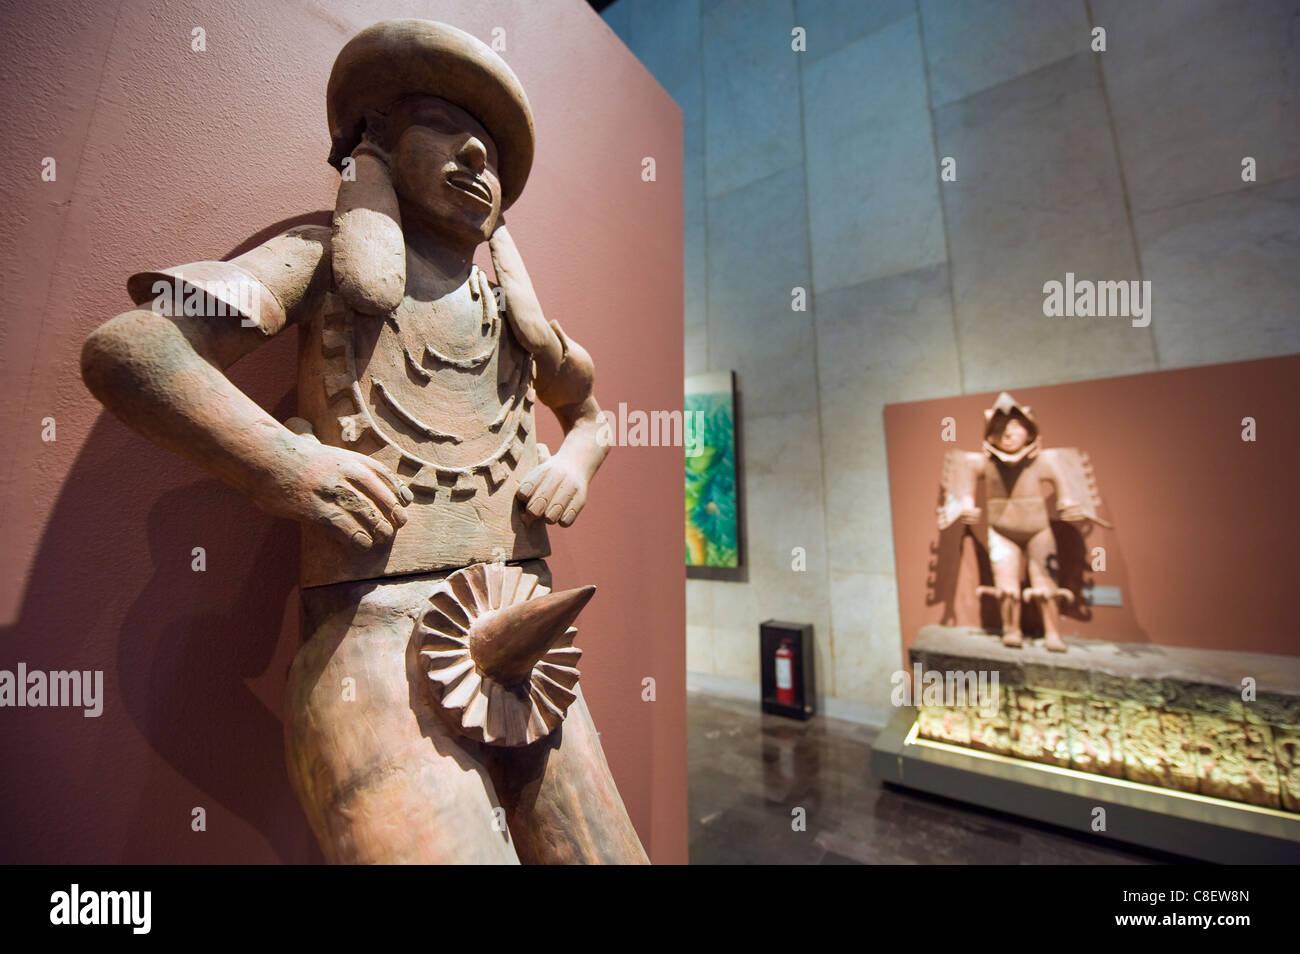 Aztec history, Museo Nacional de Antropologia (Anthropology Museum, District Federal, Mexico City, Mexico - Stock Image